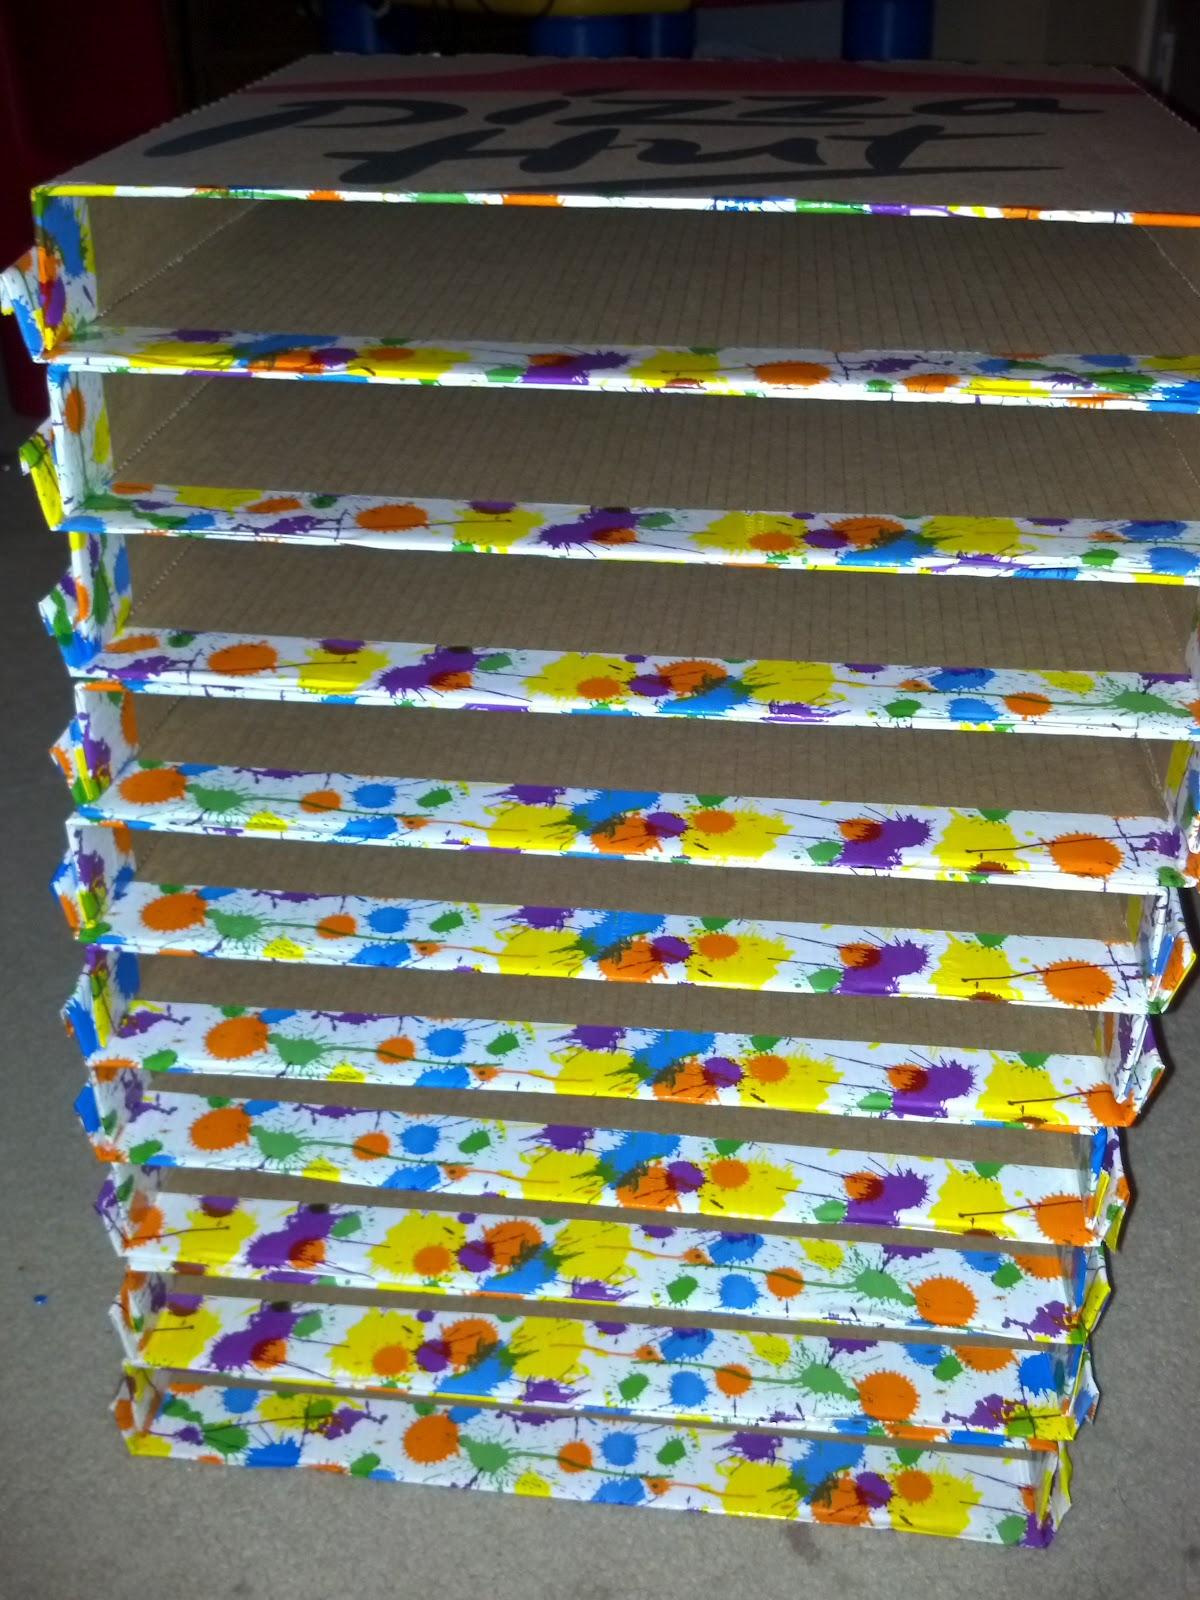 dragonflies rack new rainbow racks skies art our drying